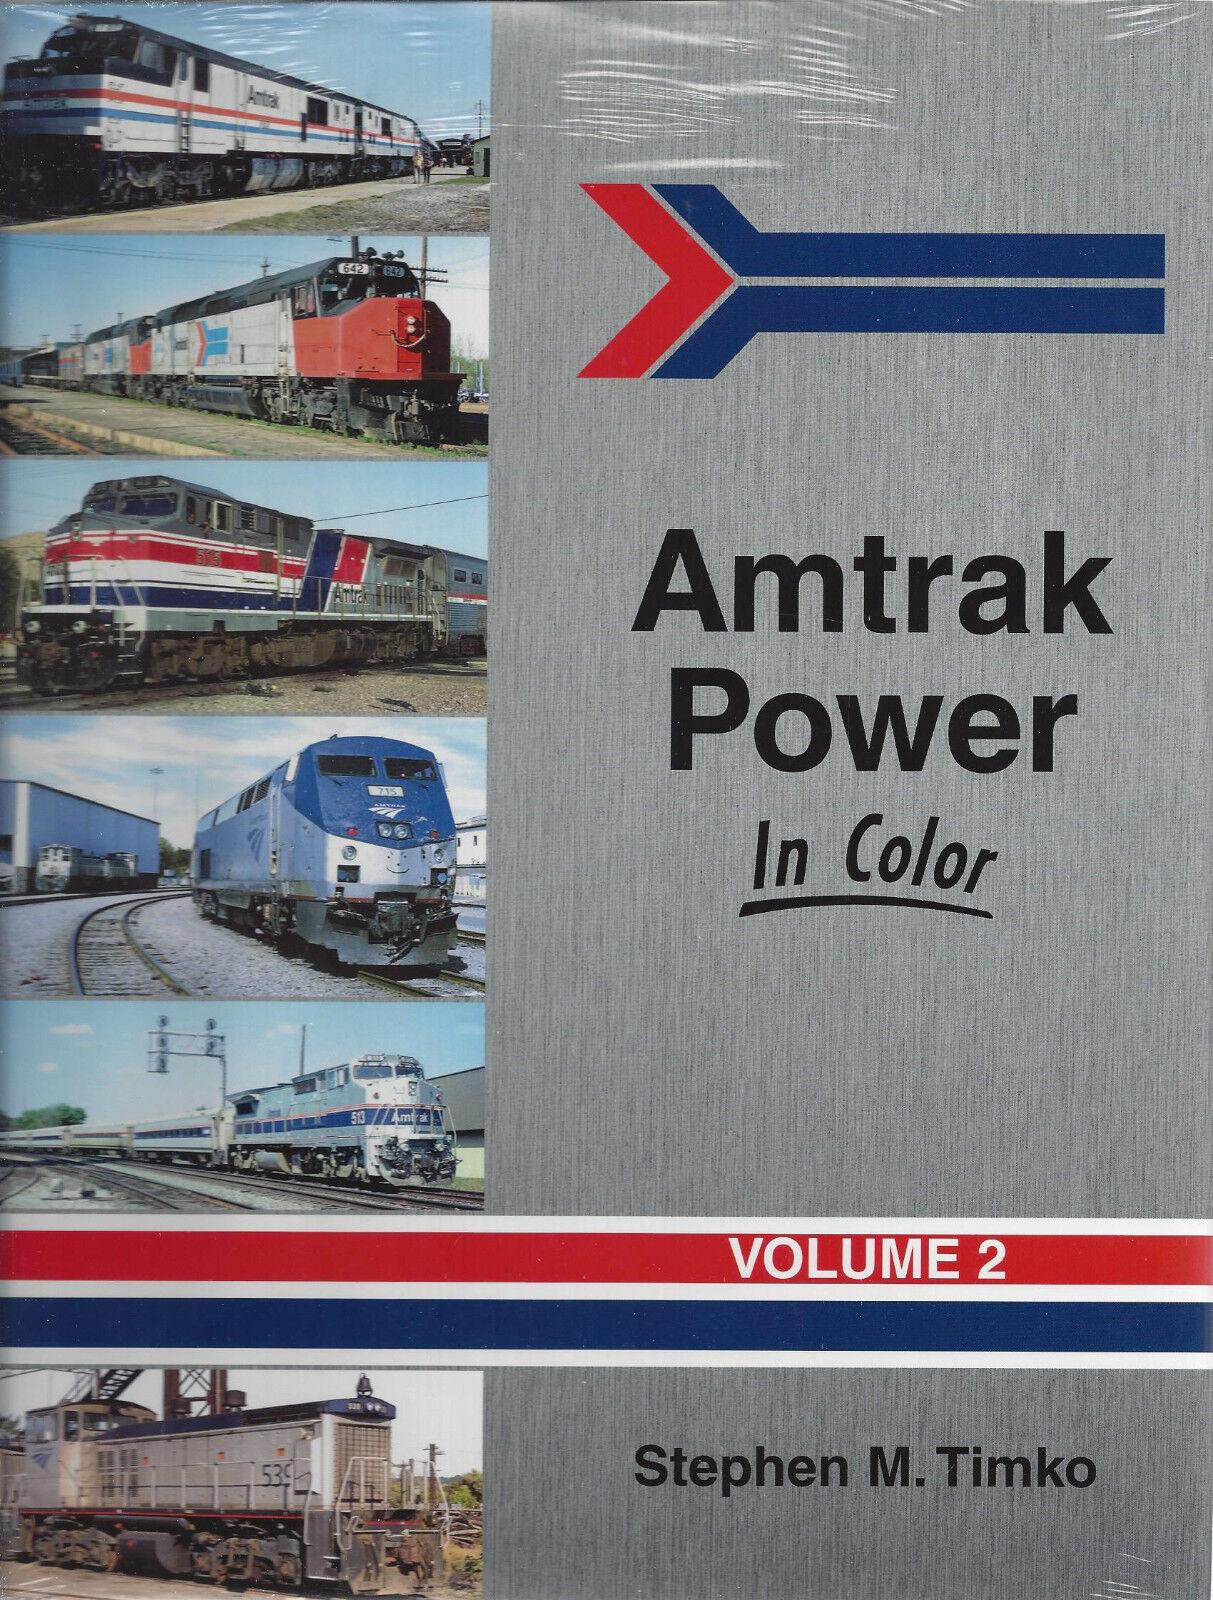 Amtrak Potenza in Colore, Vol. 2: Diesel  500 & Upward  Nuovo Libro